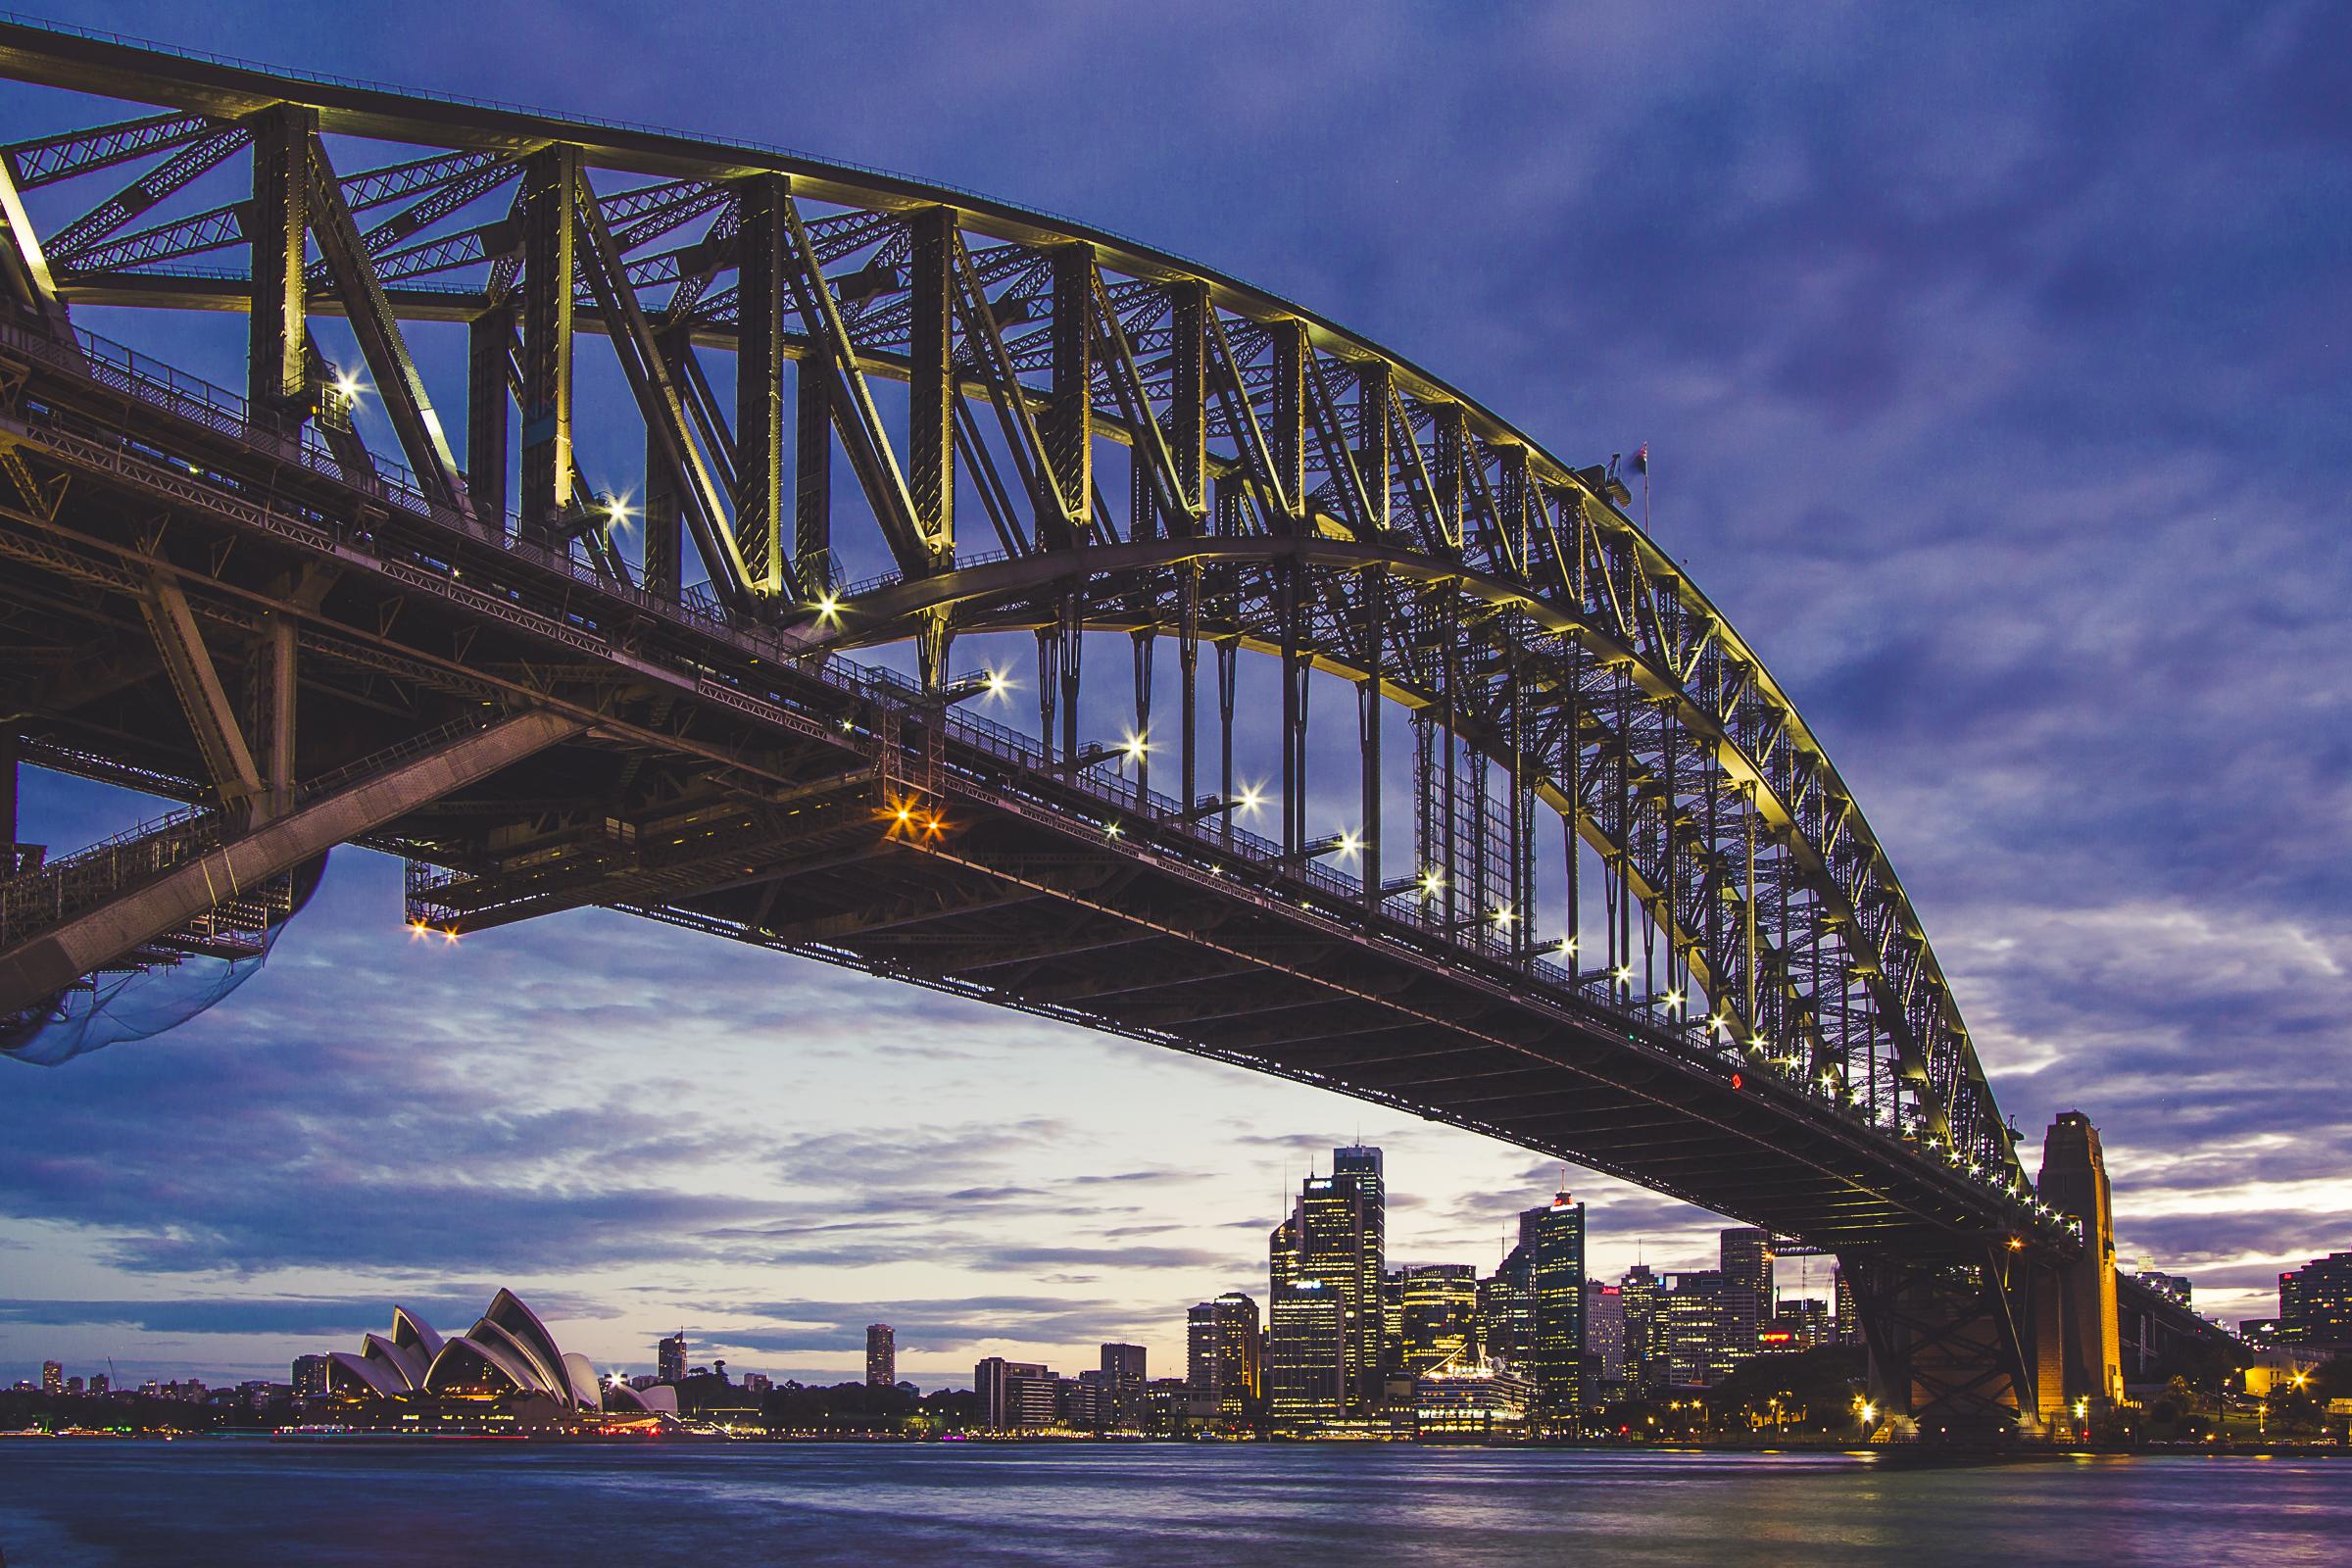 Sydney Night Photography course -